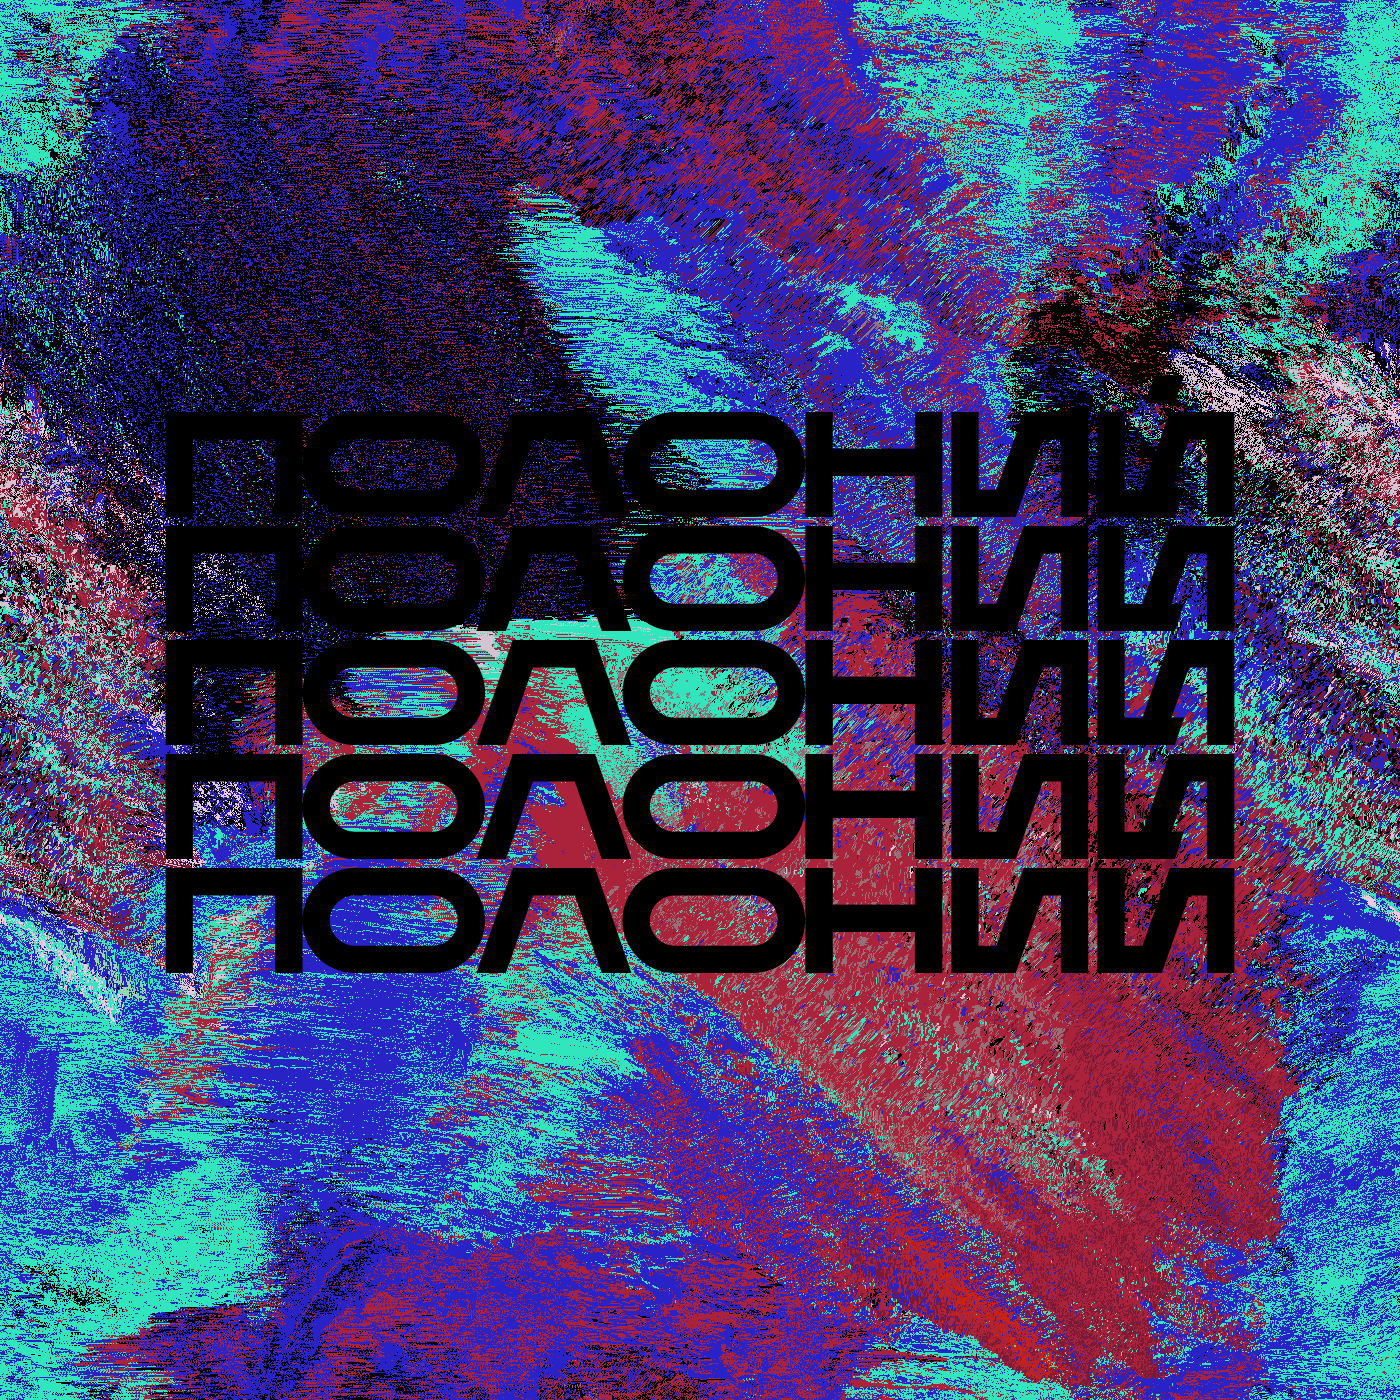 Display free Free font free fonts freebie grunge Headline Retro reverse contrast trendy